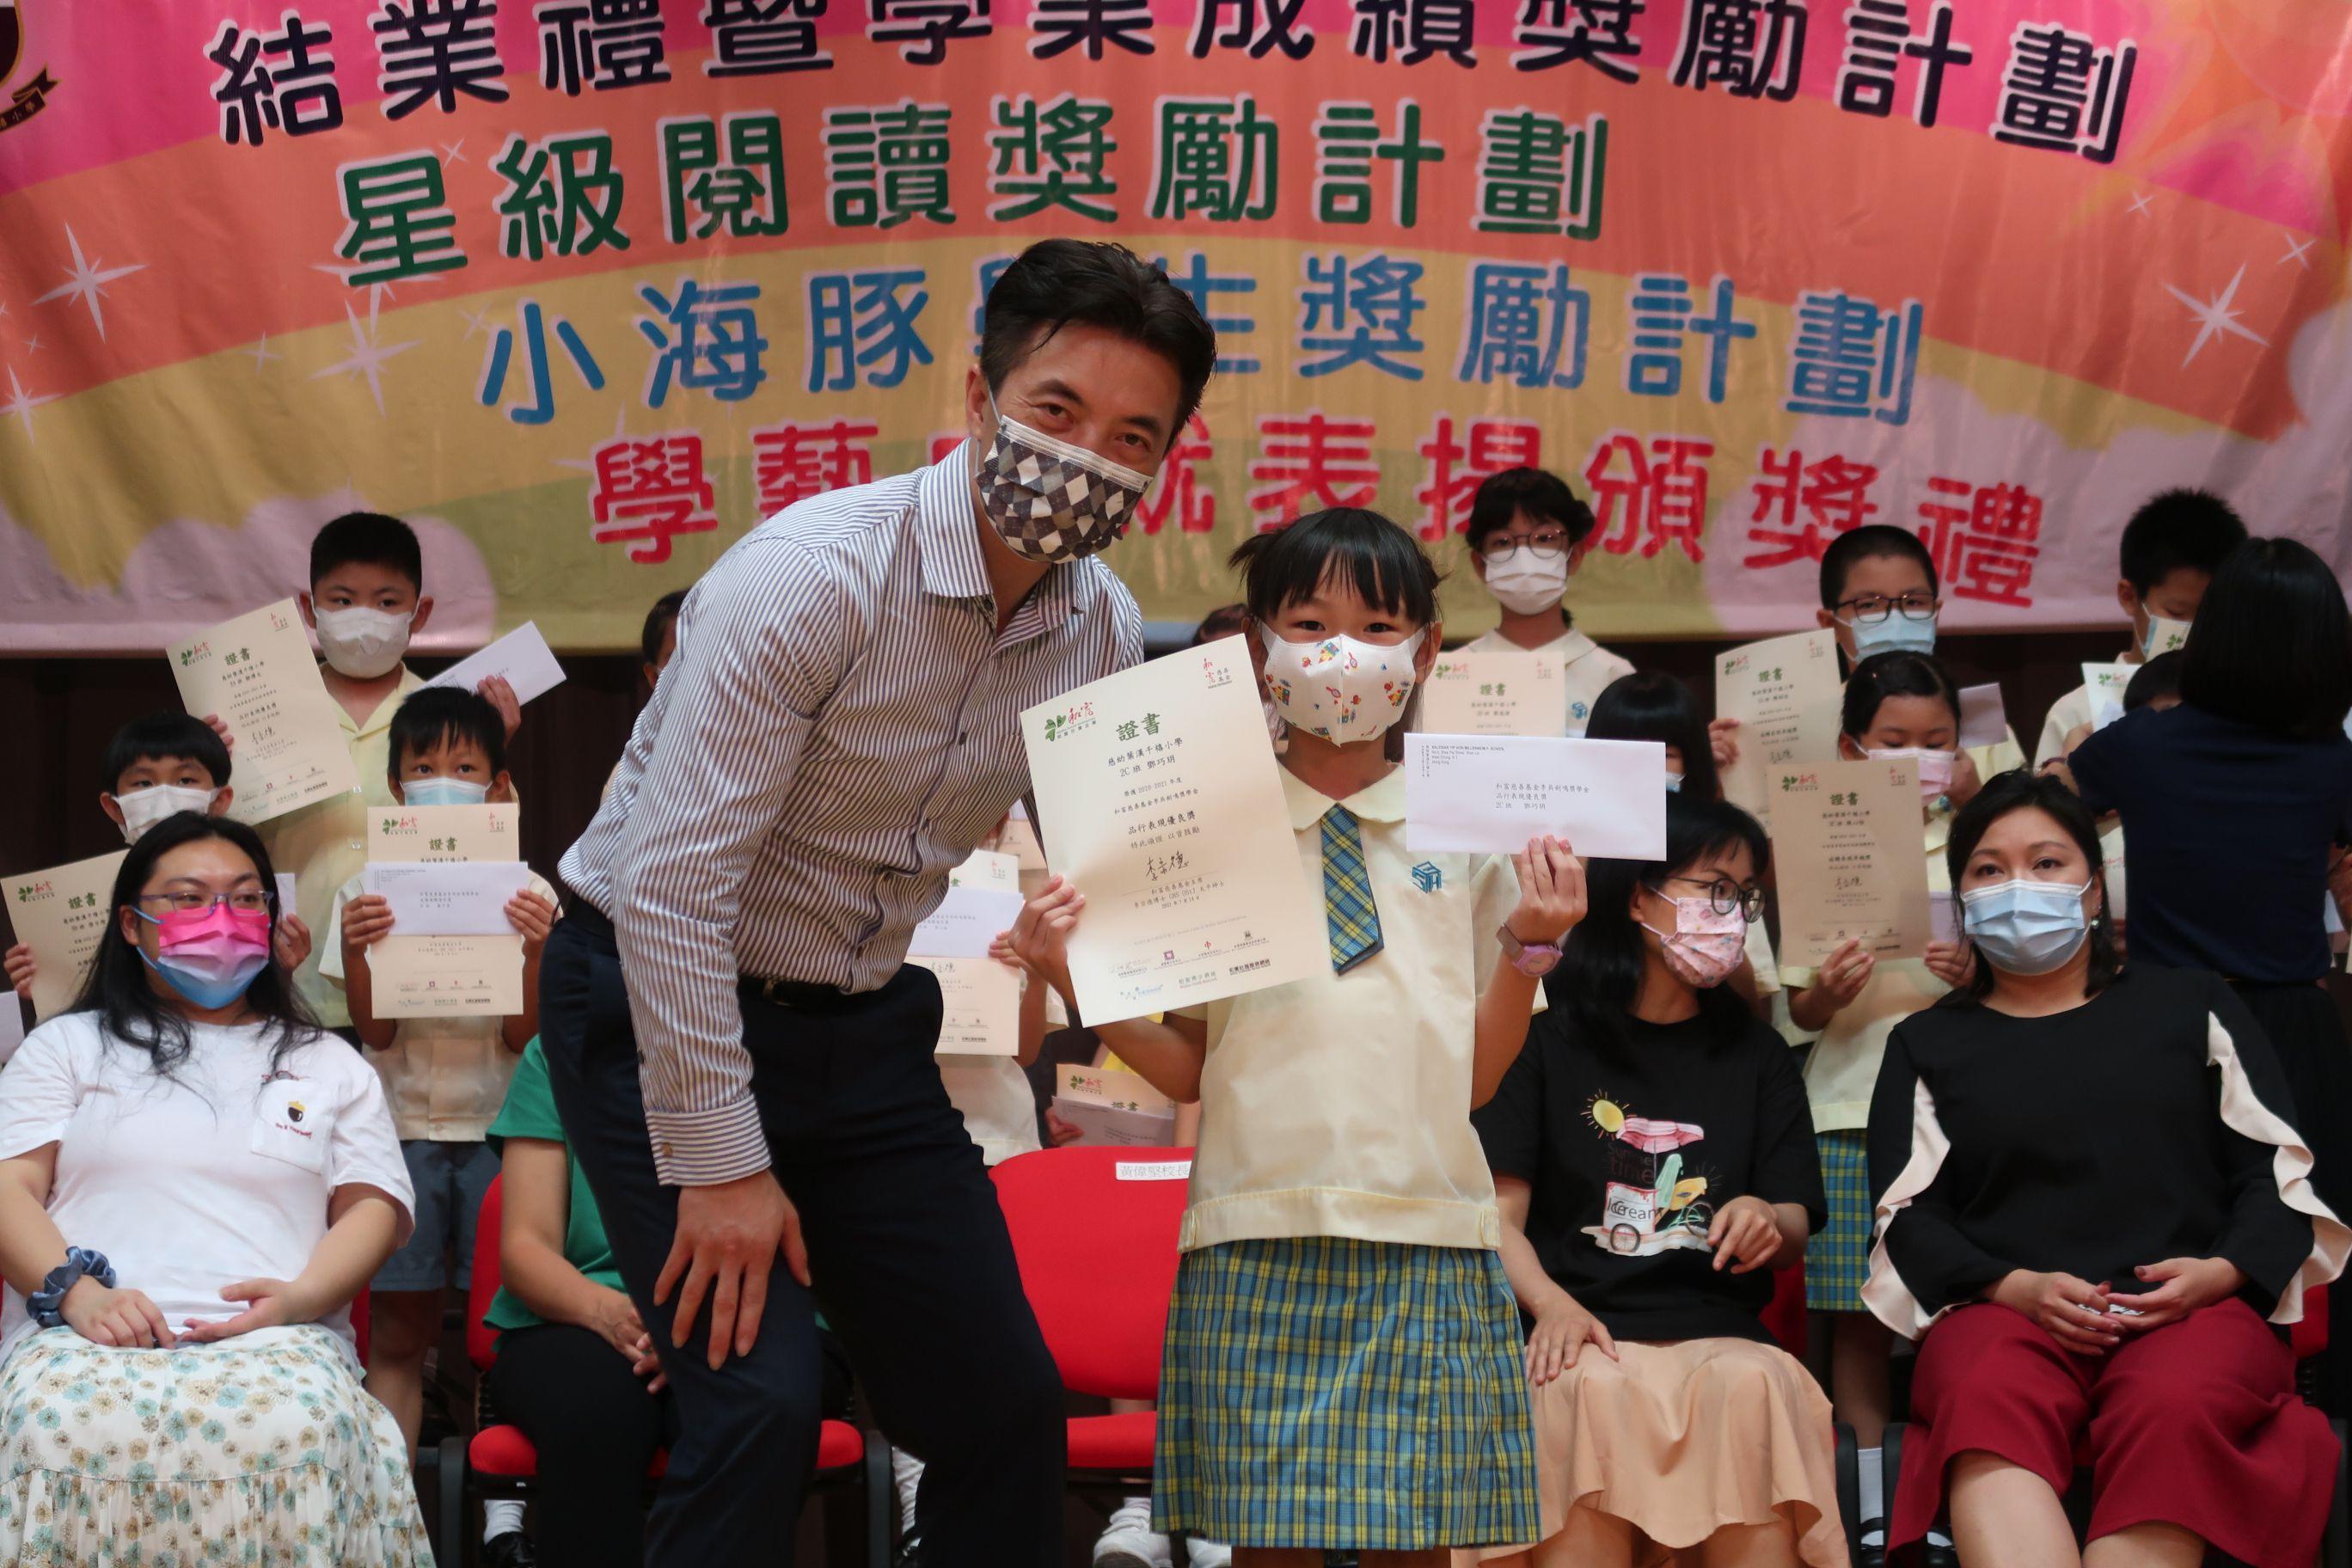 https://syh.edu.hk/sites/default/files/img_5957_1.jpg